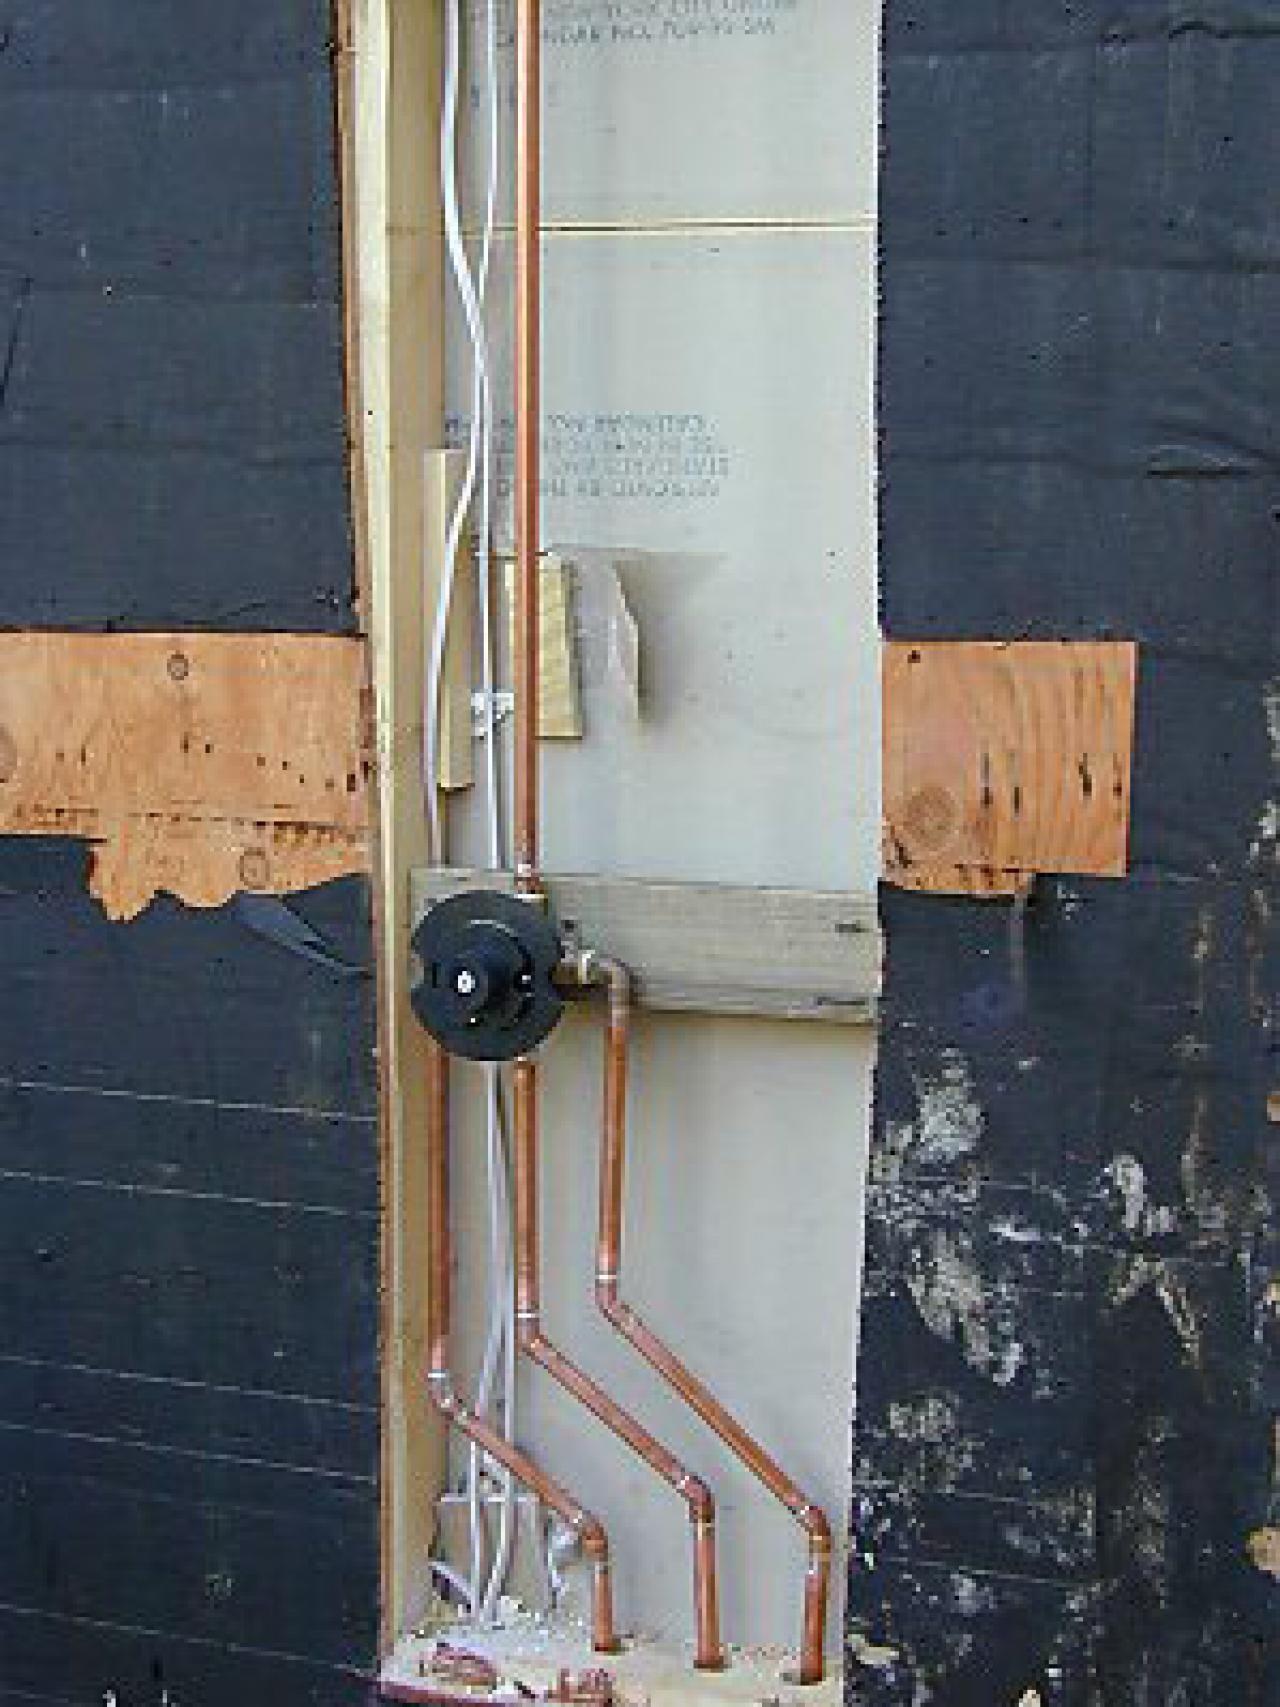 How to Build an Outdoor Shower | Outdoor bathrooms, Backyard ...